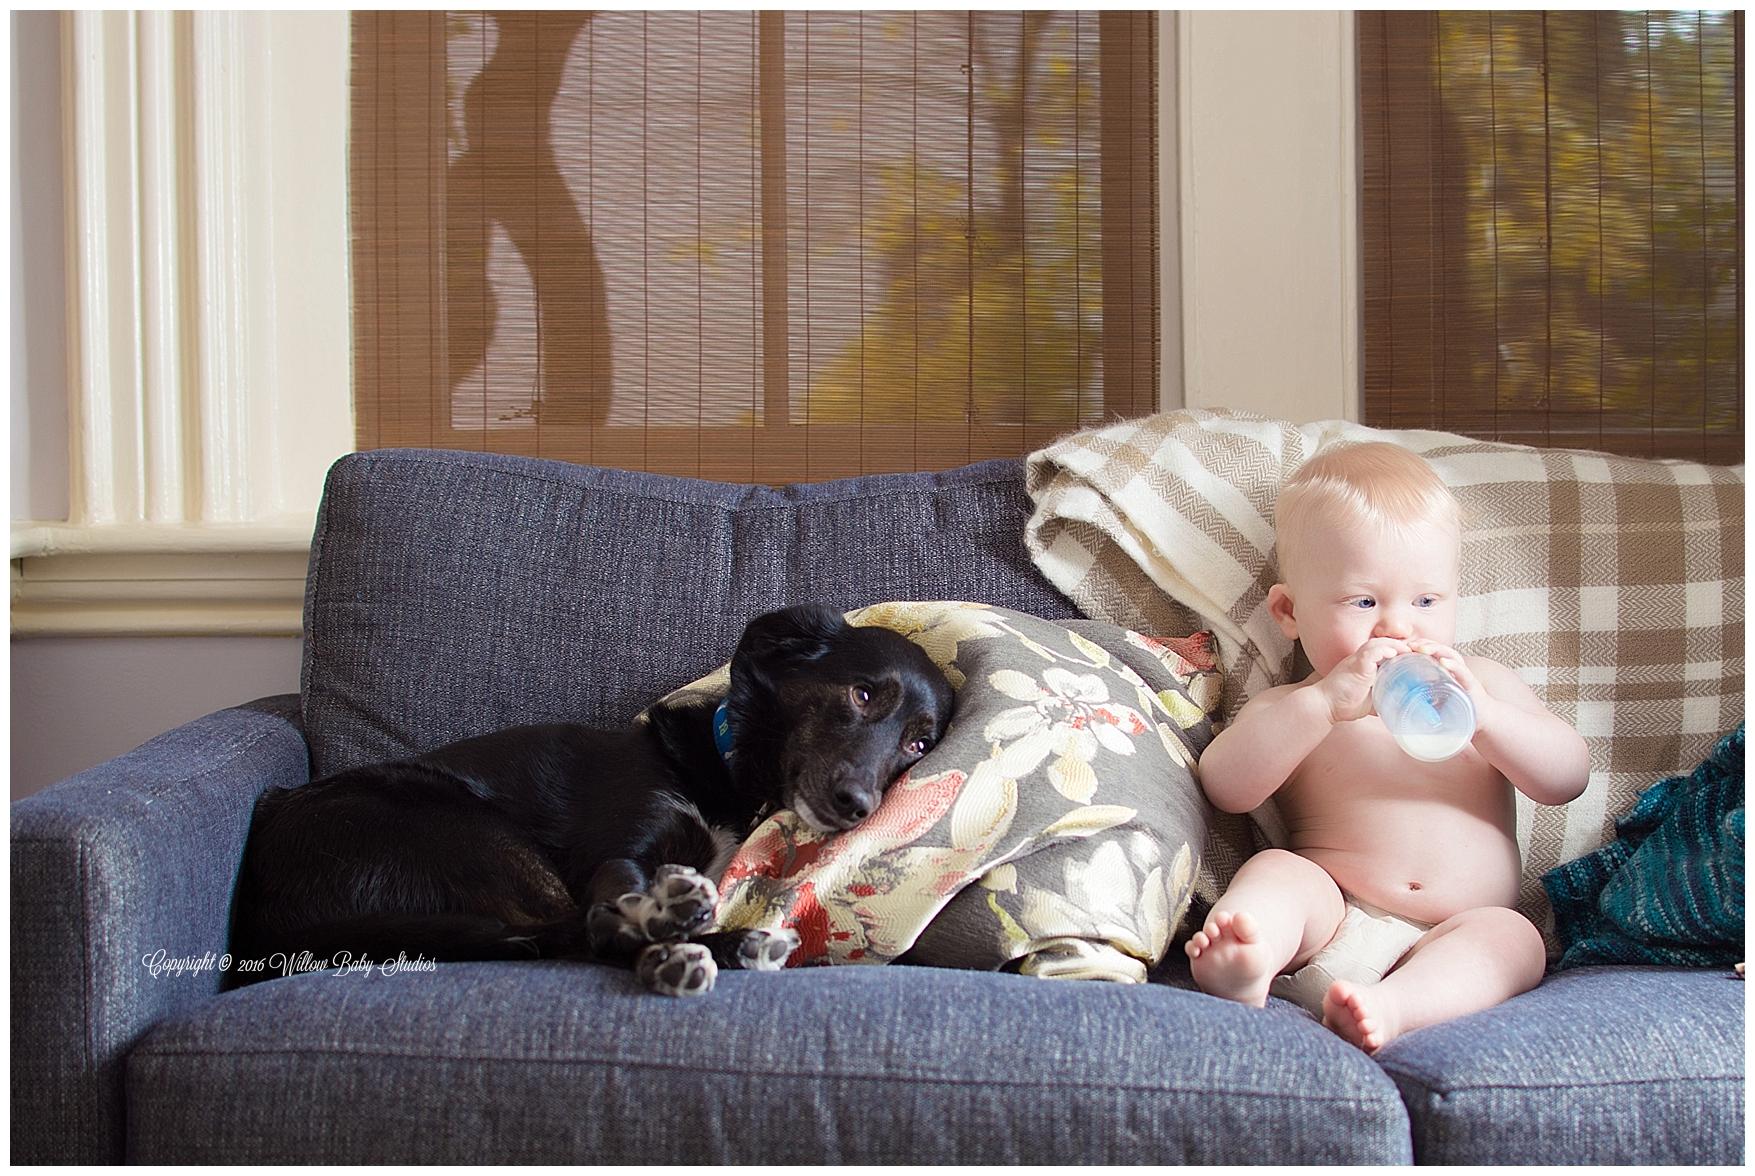 cambridge_ma_family_and_pet_photographer_01